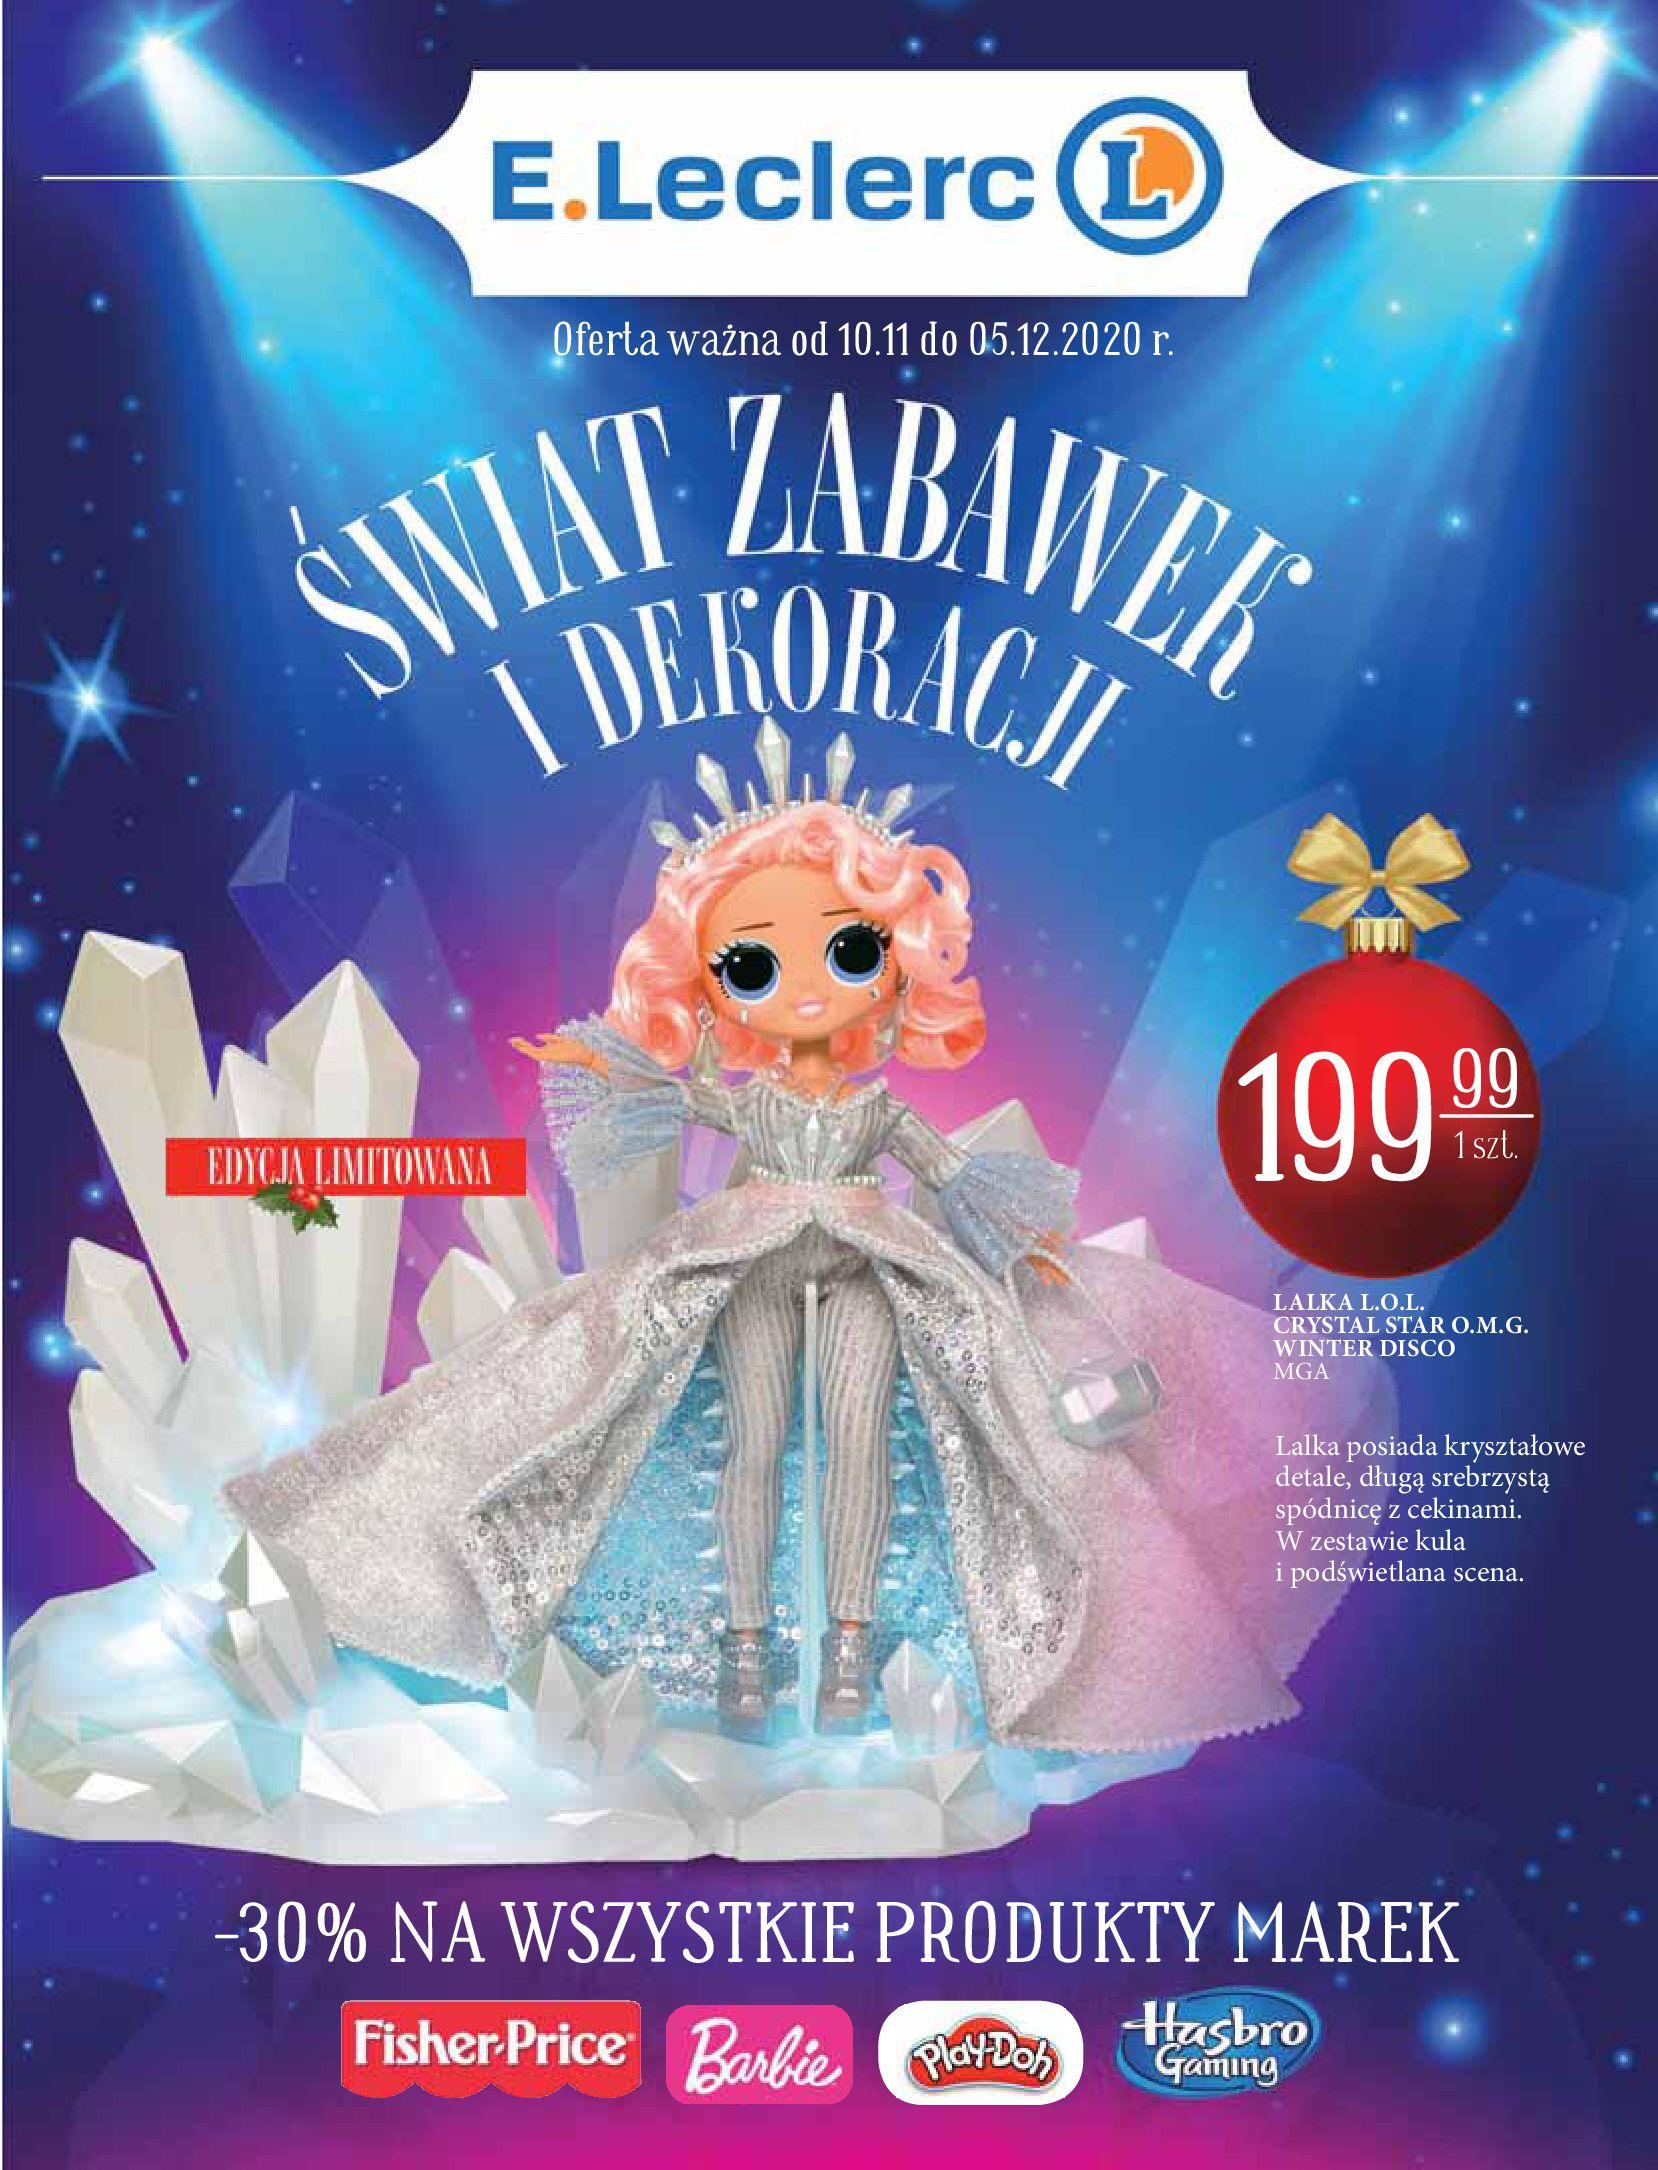 E.Leclerc:  Świat zabawek i dekoracji 09.11.2020